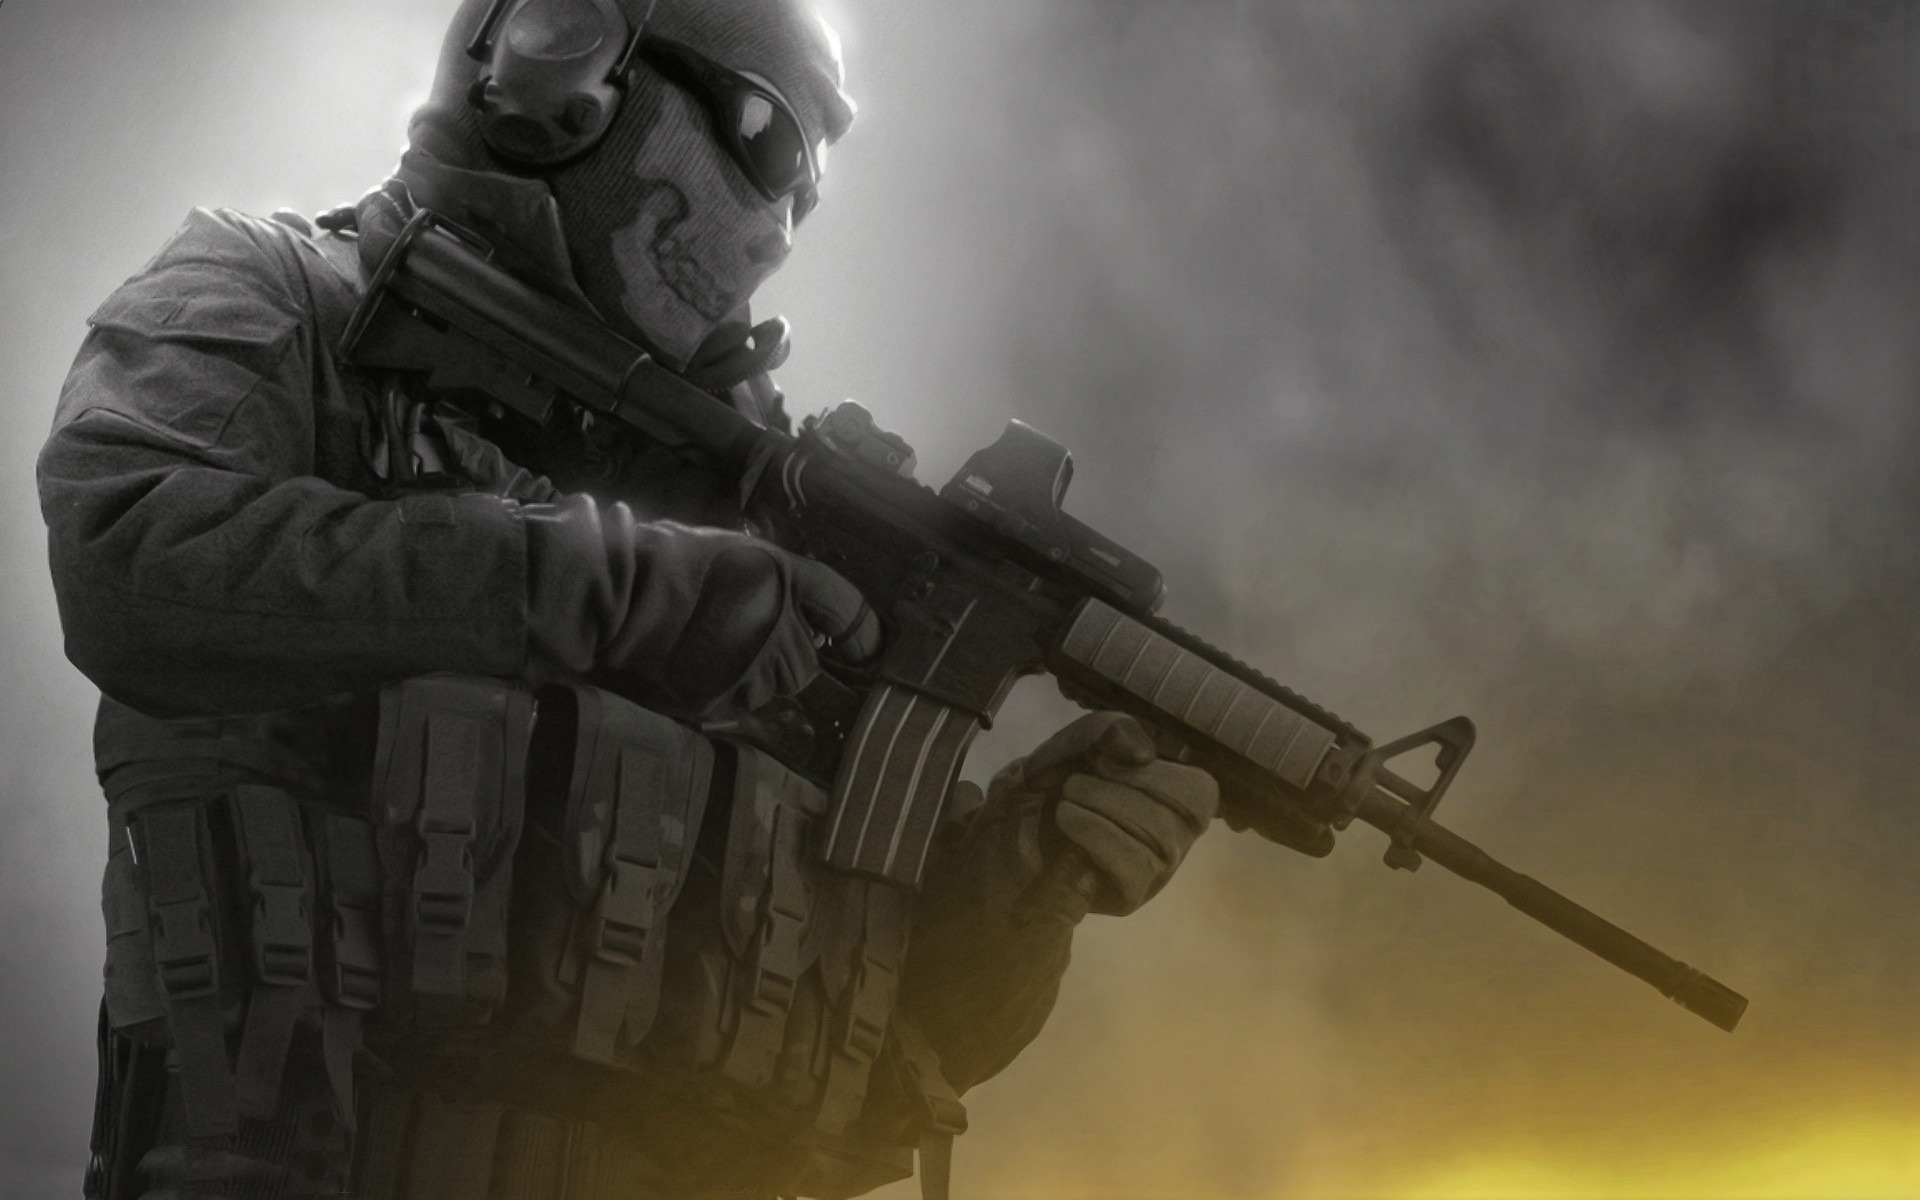 Steam Workshop :: CallOfDutyWeaponPorts/Mods